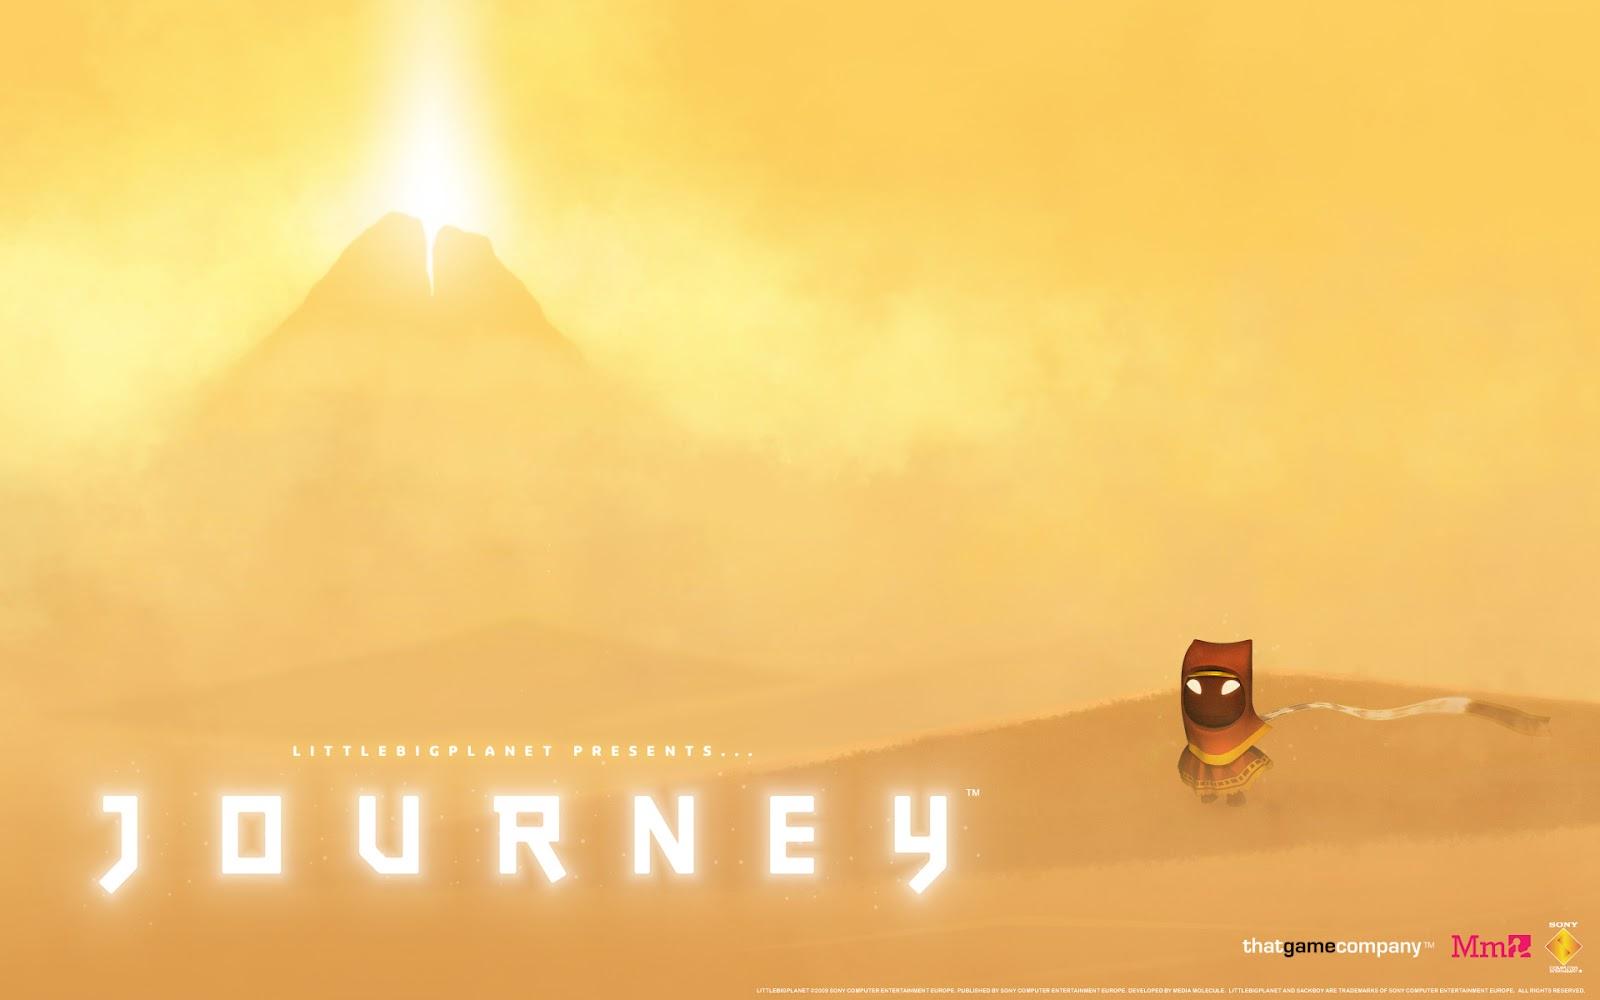 http://2.bp.blogspot.com/-7Hc4HaPZJkE/T5zqWw6x3uI/AAAAAAAABP4/D_xYCh1FclM/s1600/journey-1920x1200+(1).jpg